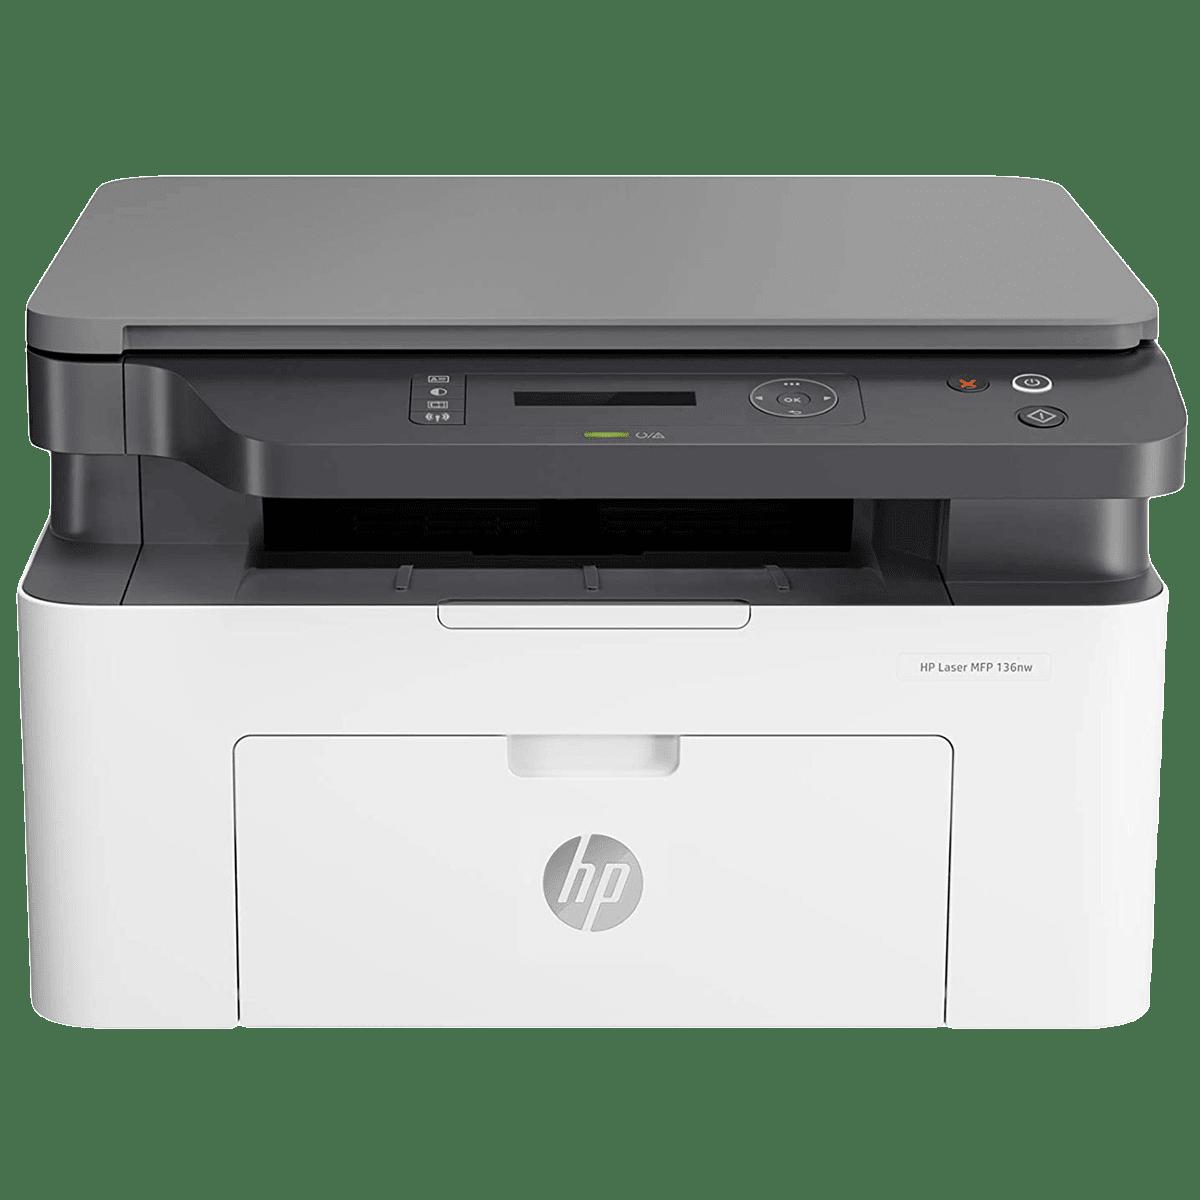 HP Laser 136nw Wireless Black & White Multi-Function Laserjet Printer (Mobile Printing Capability, 4ZB87A, White)